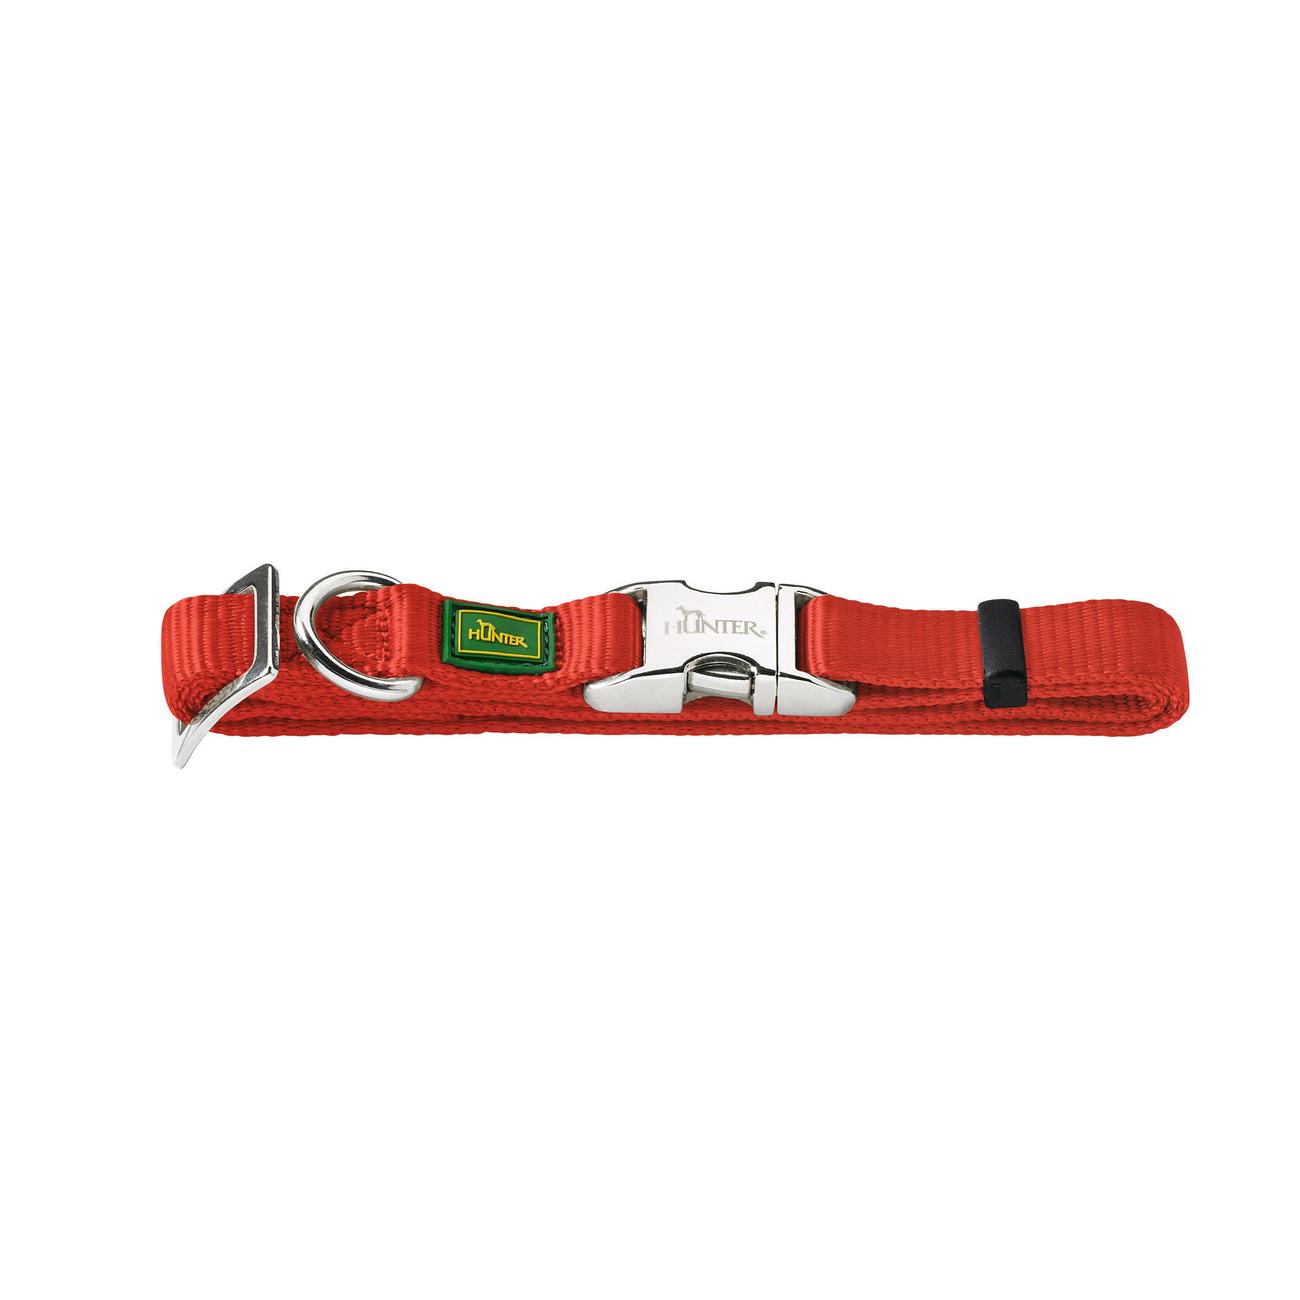 Hunter Halsband Vario Basic Alu Strong Verschluss 46668, Bild 8